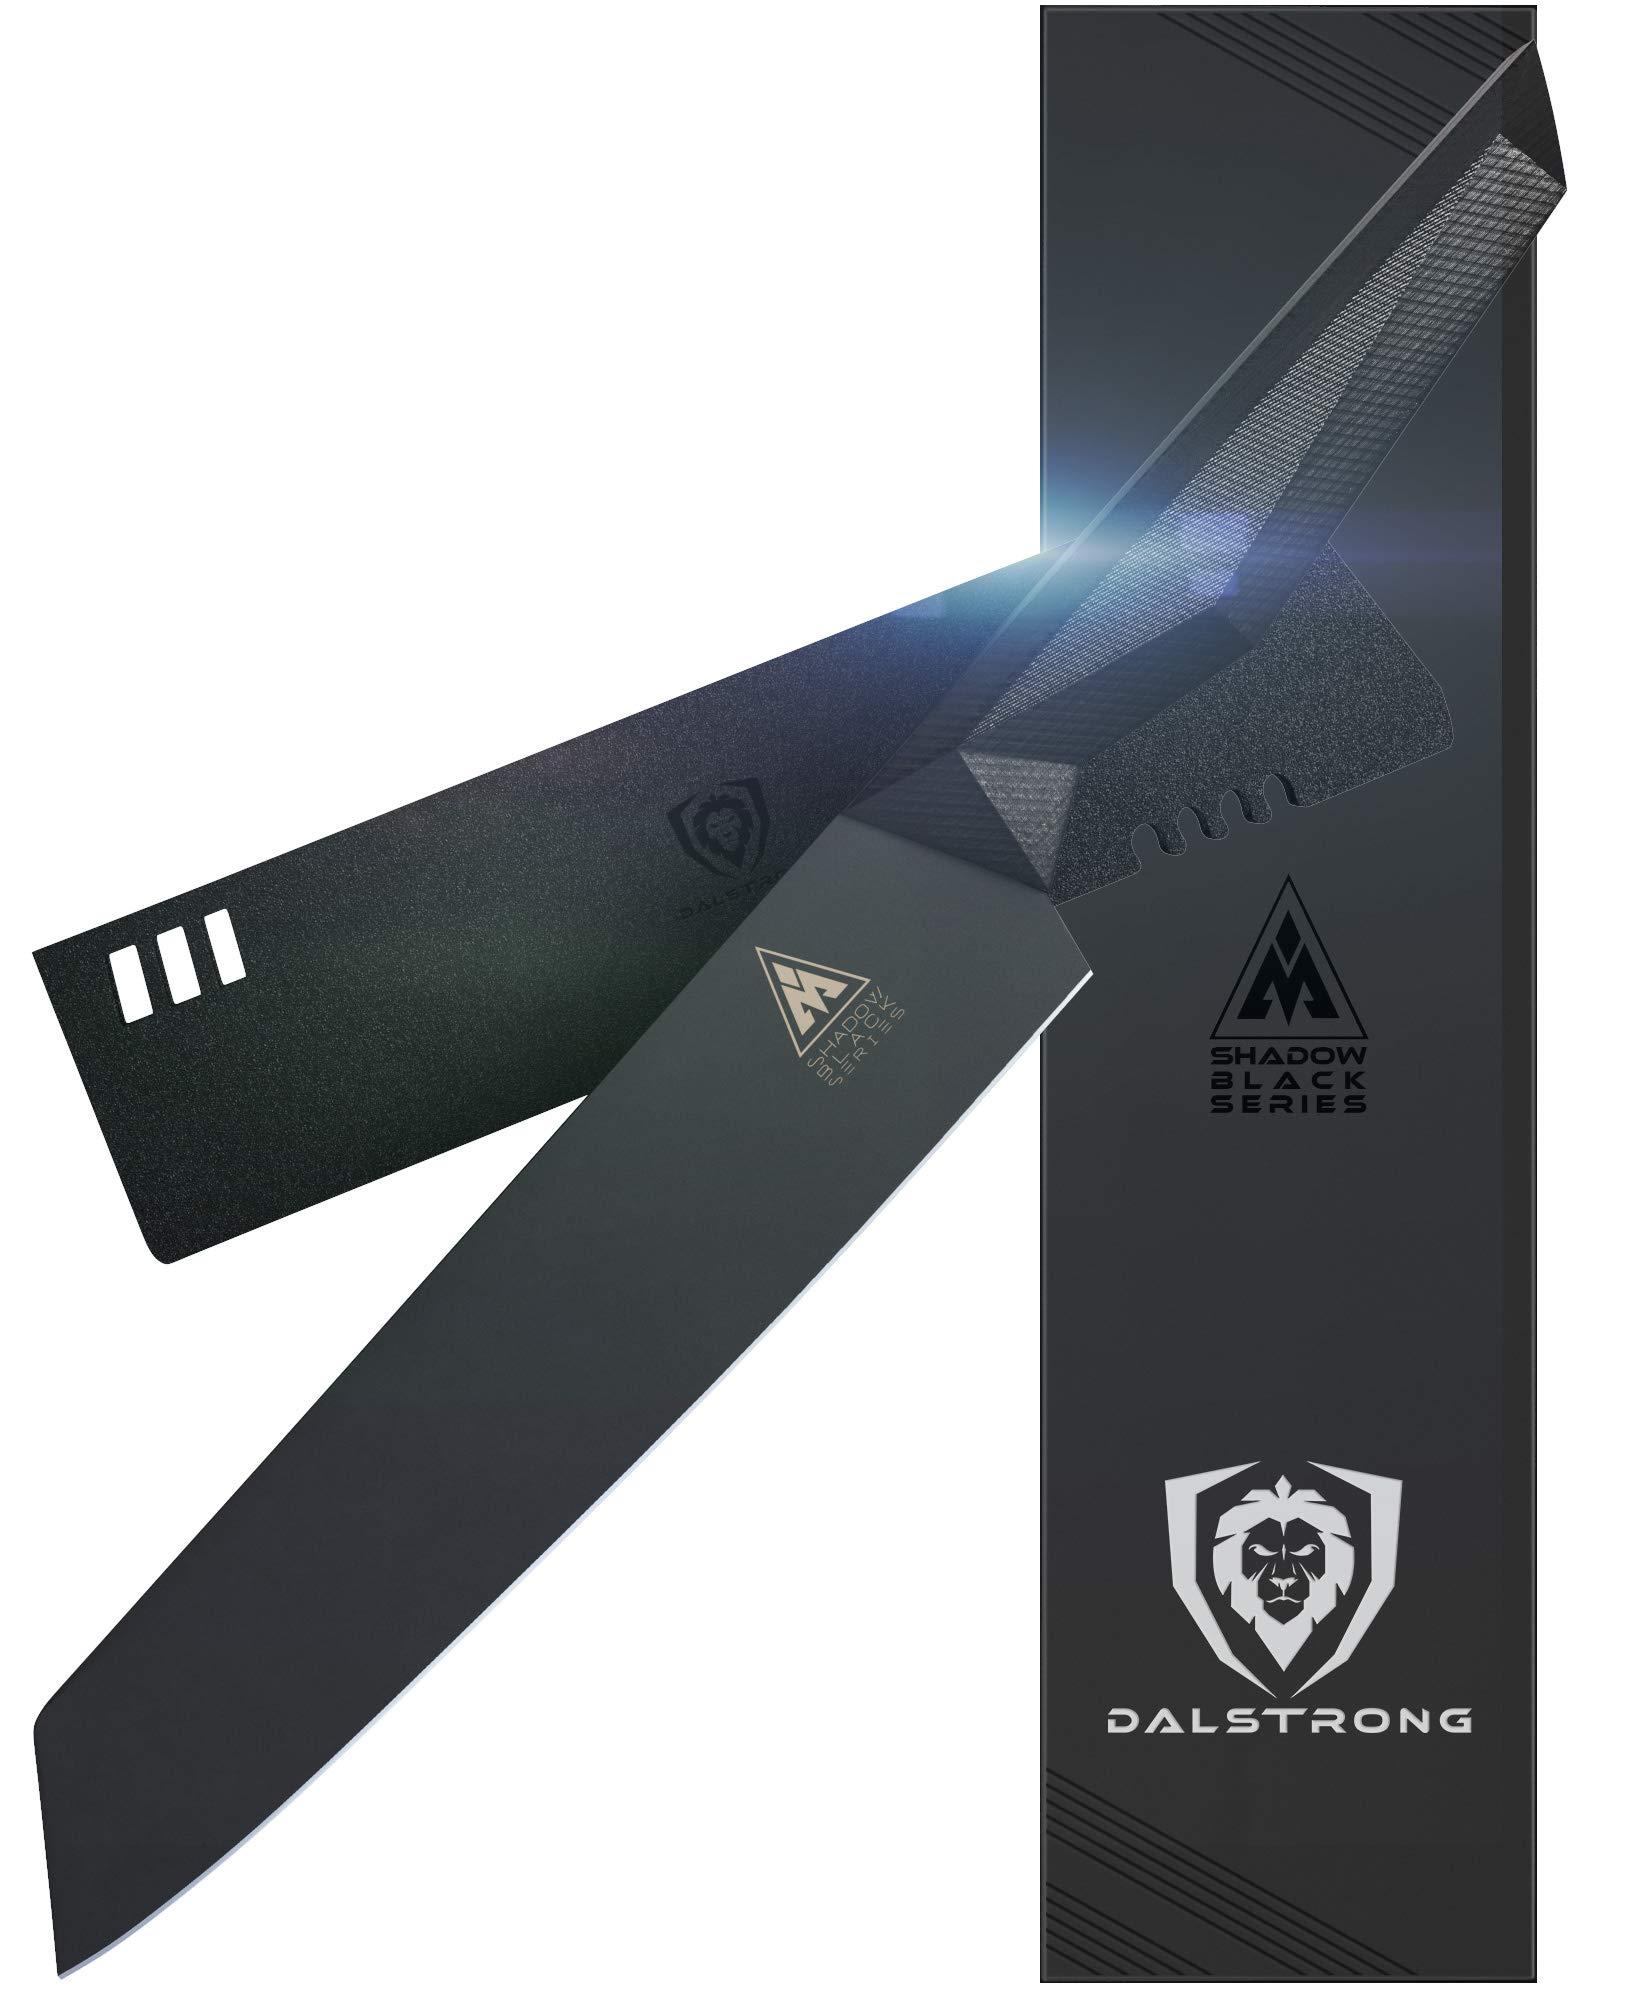 DALSTRONG - 8.5'' Kiritsuke Knife - Shadow Black Series - Black Titanium Nitride Coated German HC Steel - Sheath - NSF Certified by Dalstrong